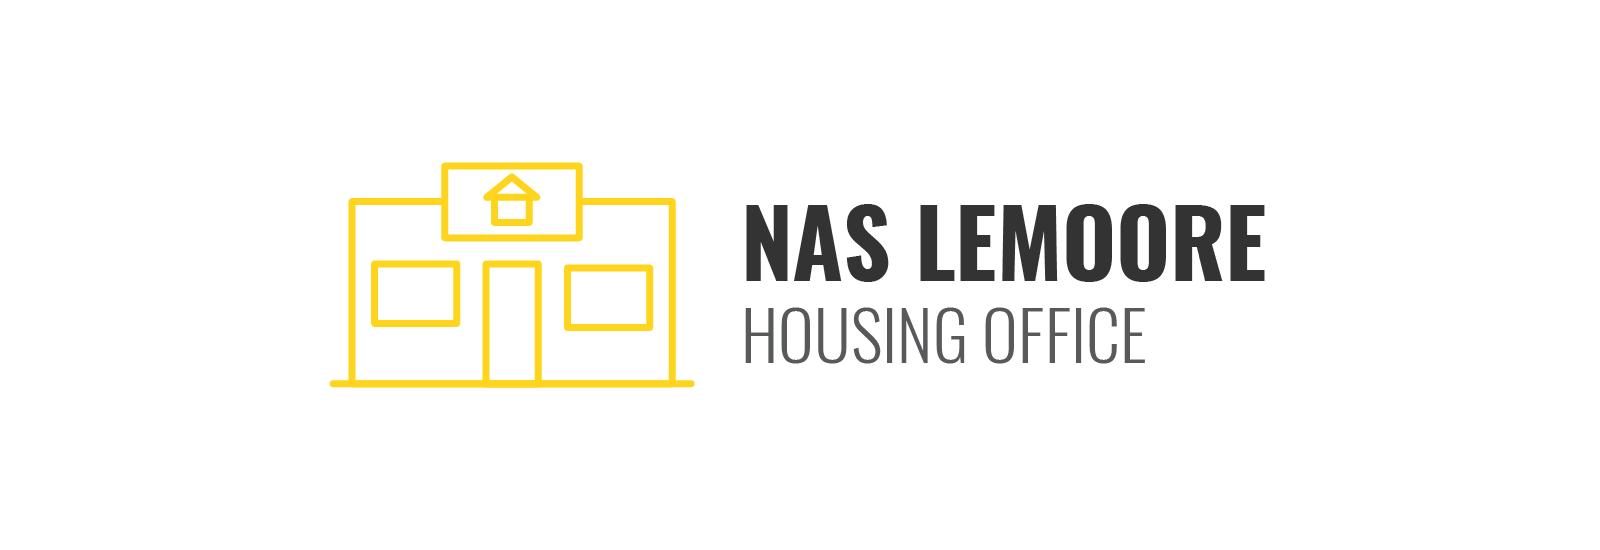 NAS Lemoore Housing Office